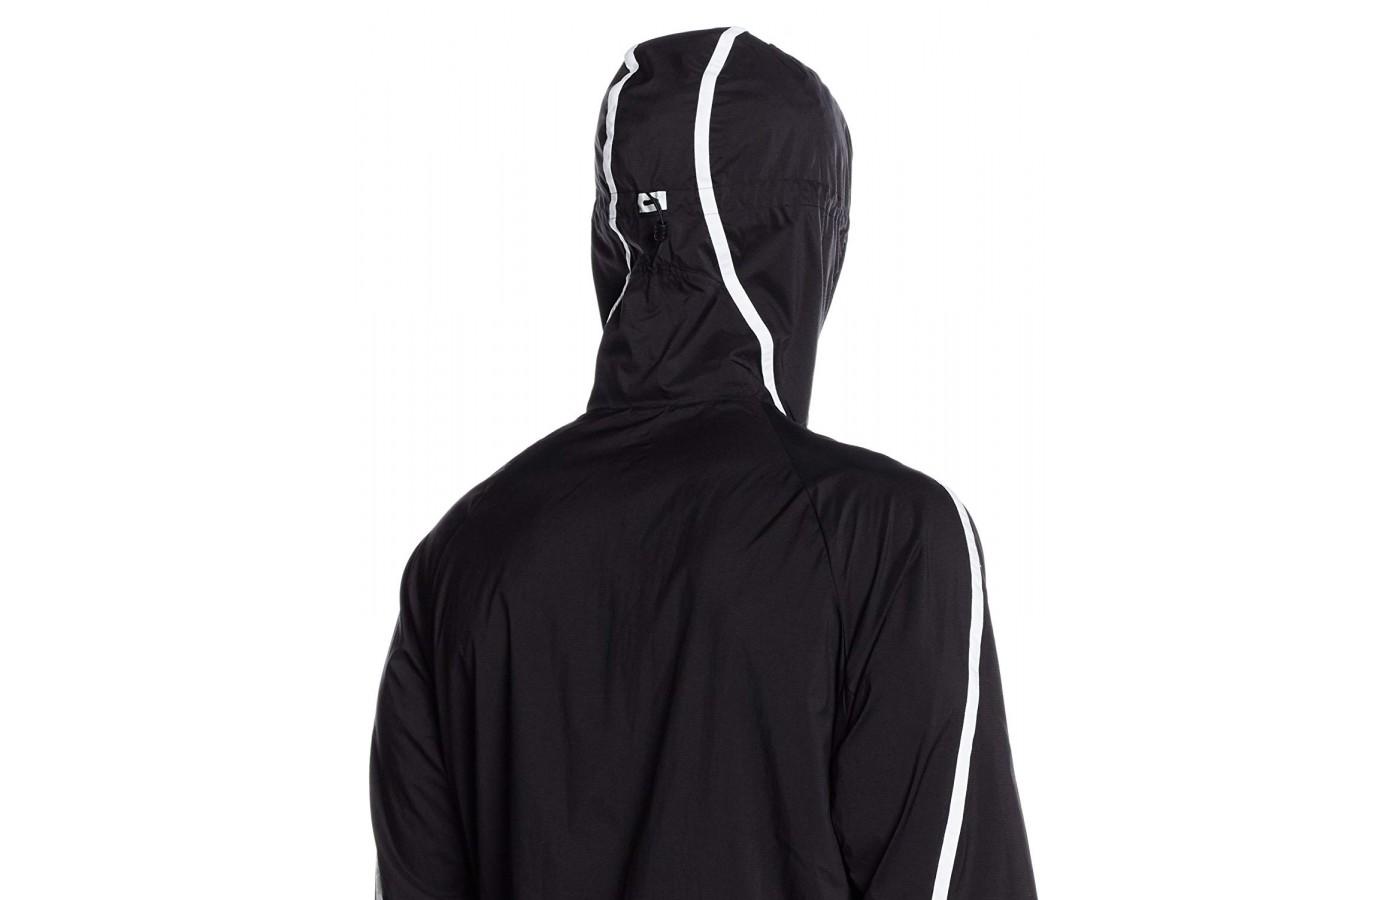 Nike Impossibly Light Jacket hod